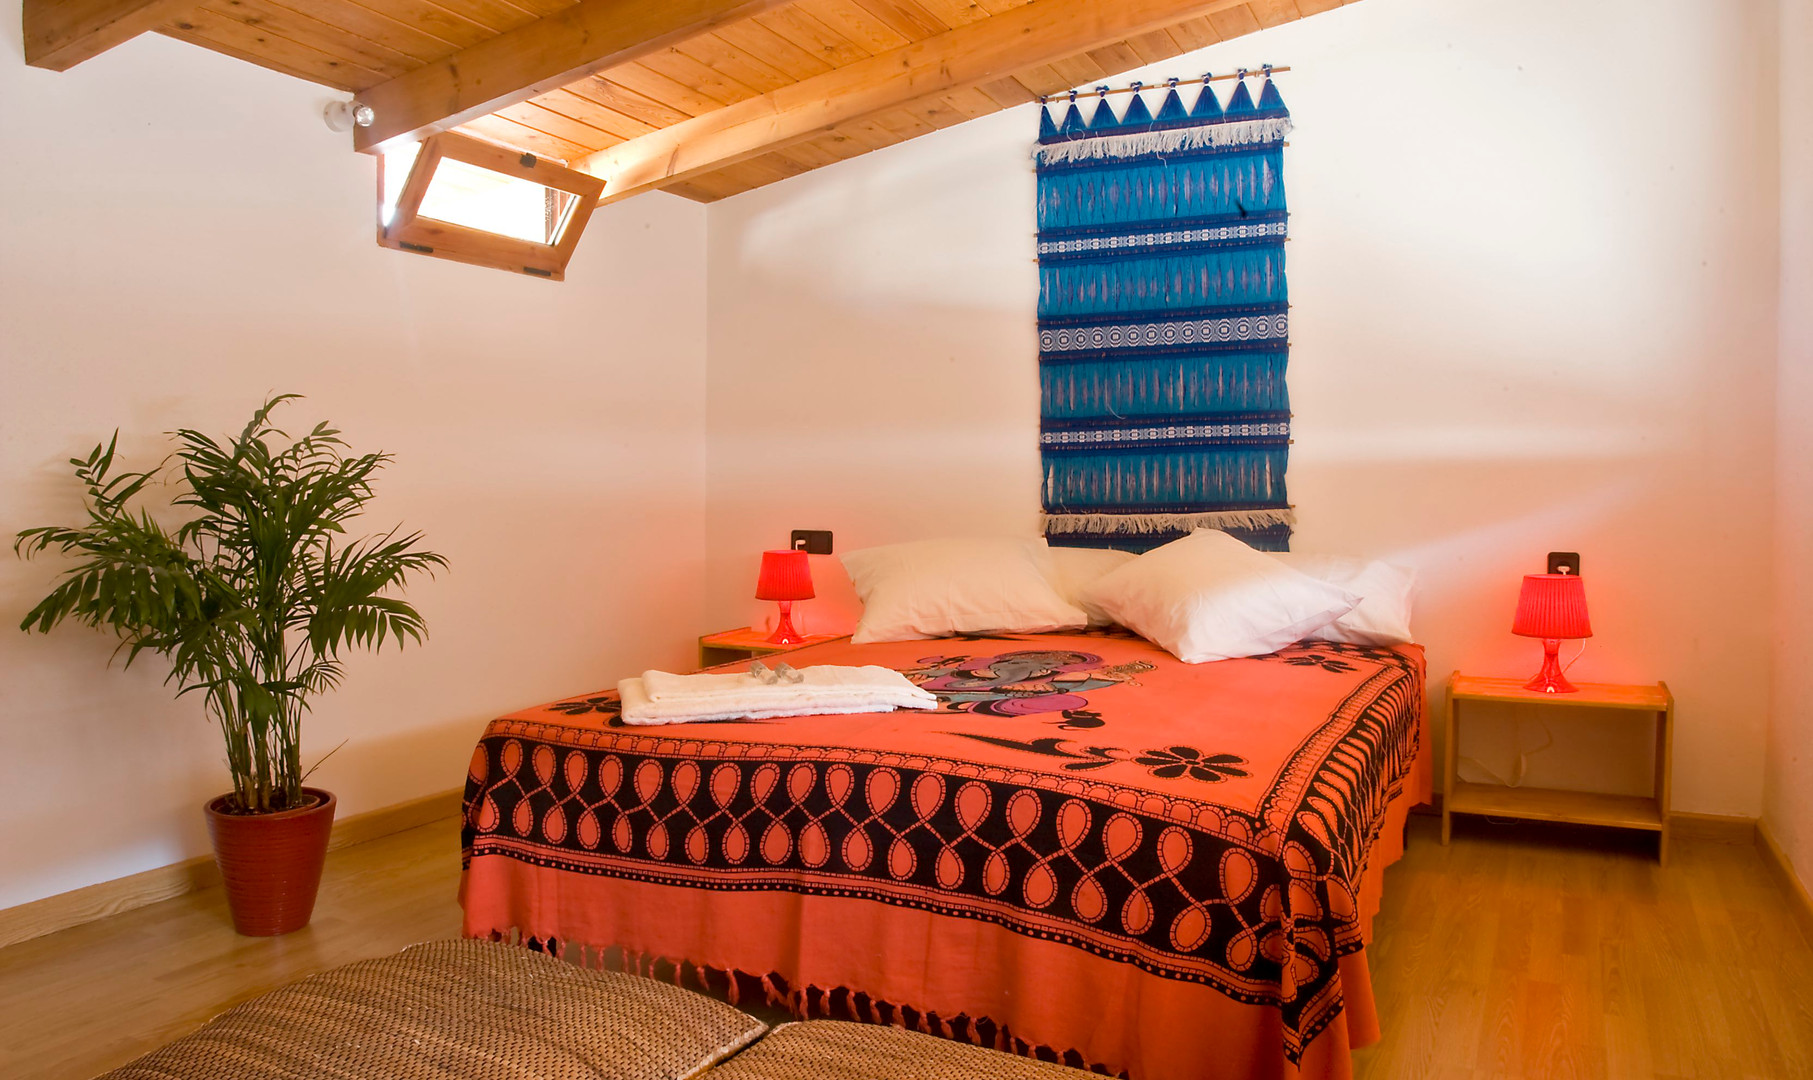 Casa 2 Dormitorio Buhardilla